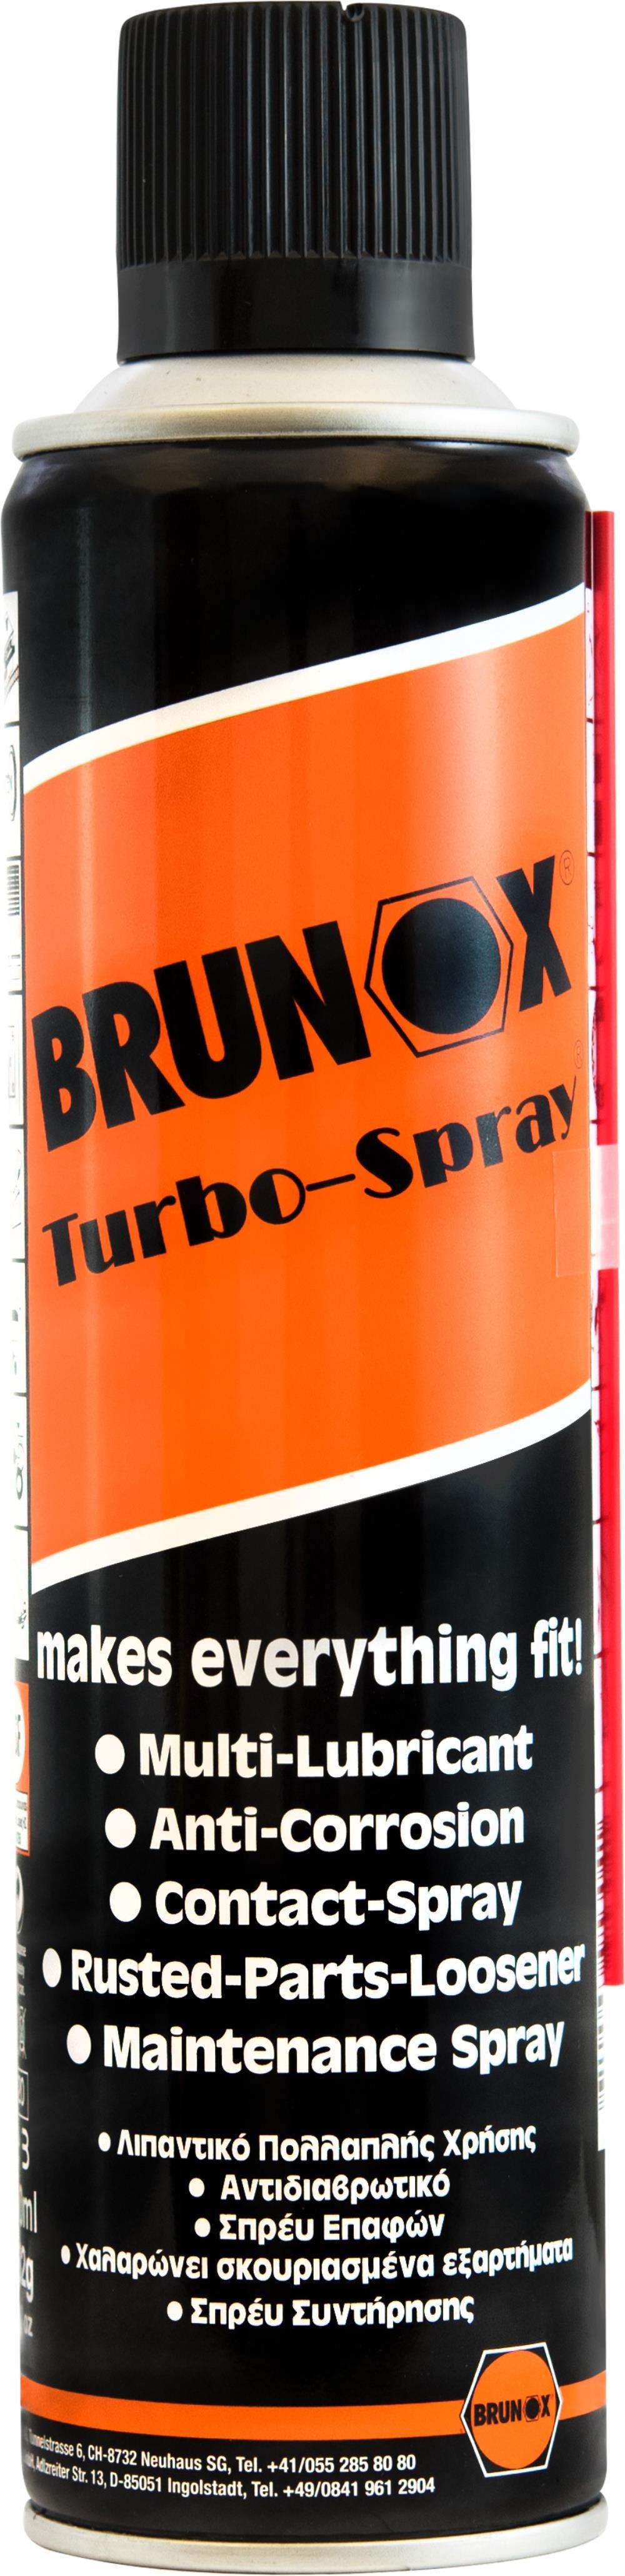 Brunox turbo spray multi function spray 400ml essex motorcycles new used bike sales - New uses for the multifunctional spray ...